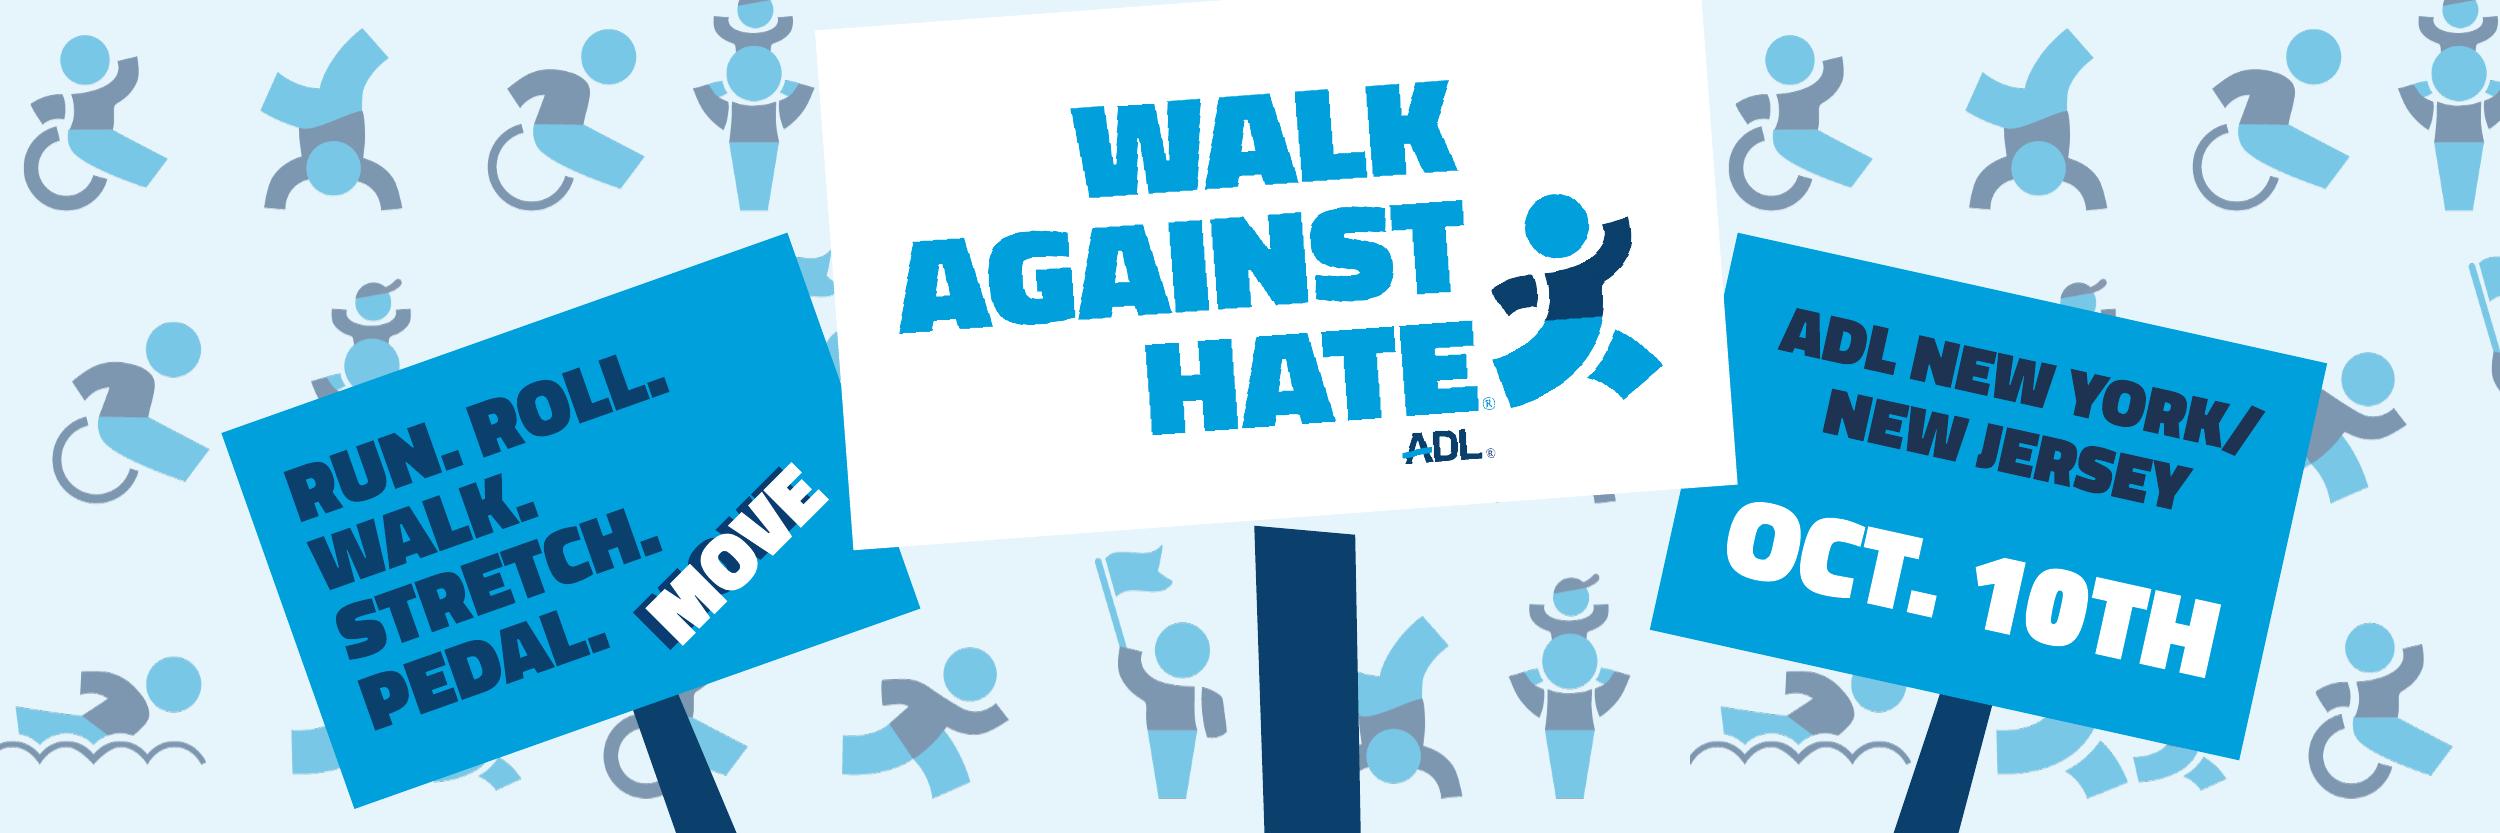 ADL Walk Against Hate